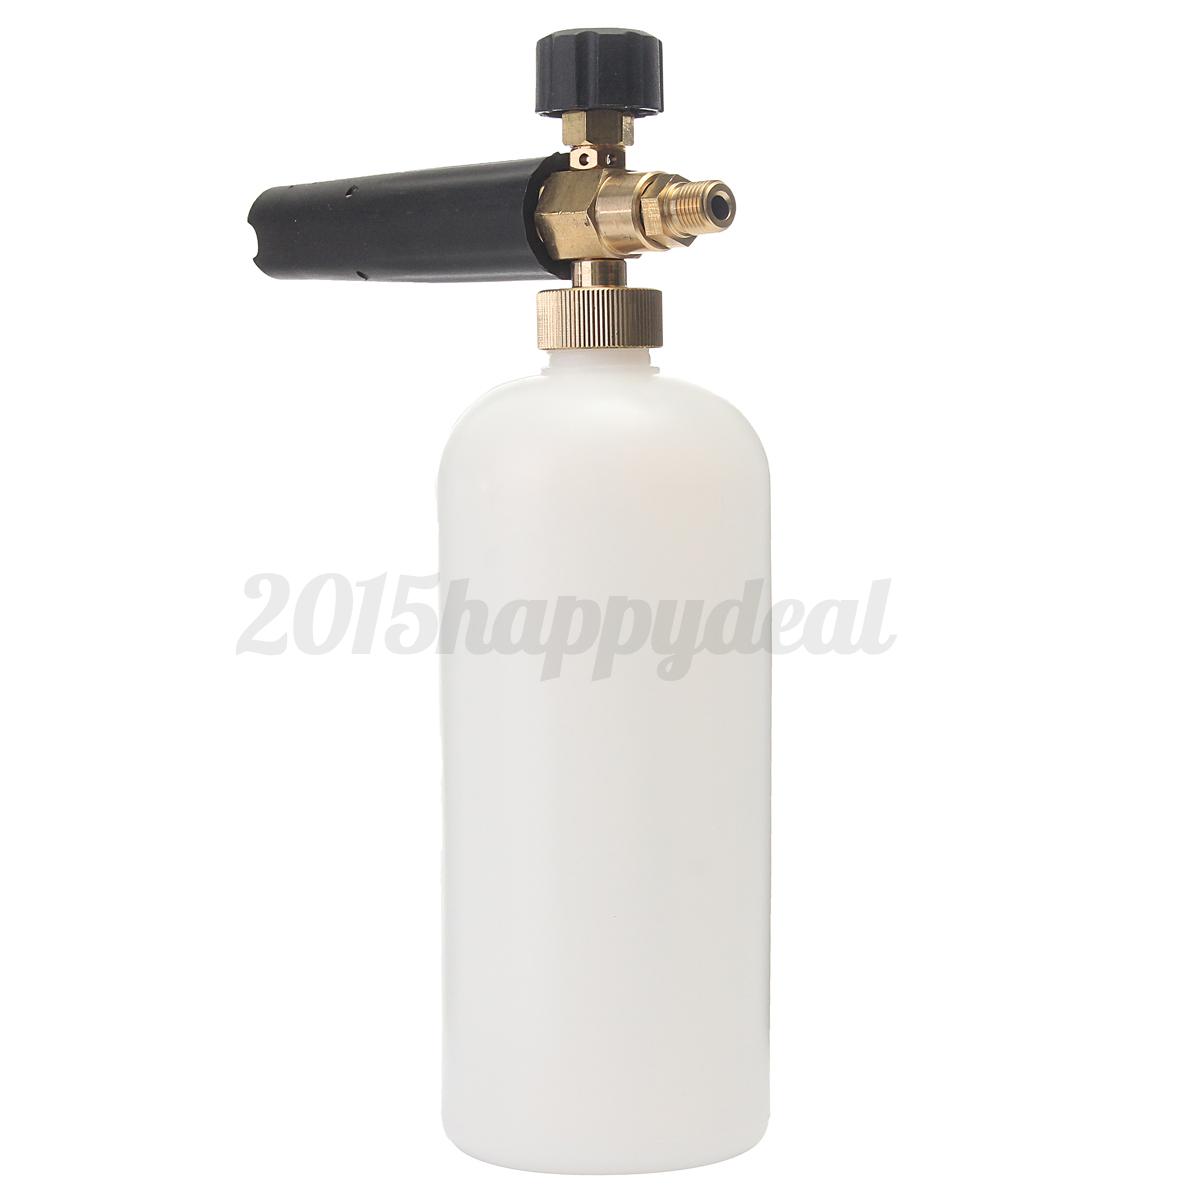 Pressure Washer Snow Foam Lance Bottle 1 4 Adapter For